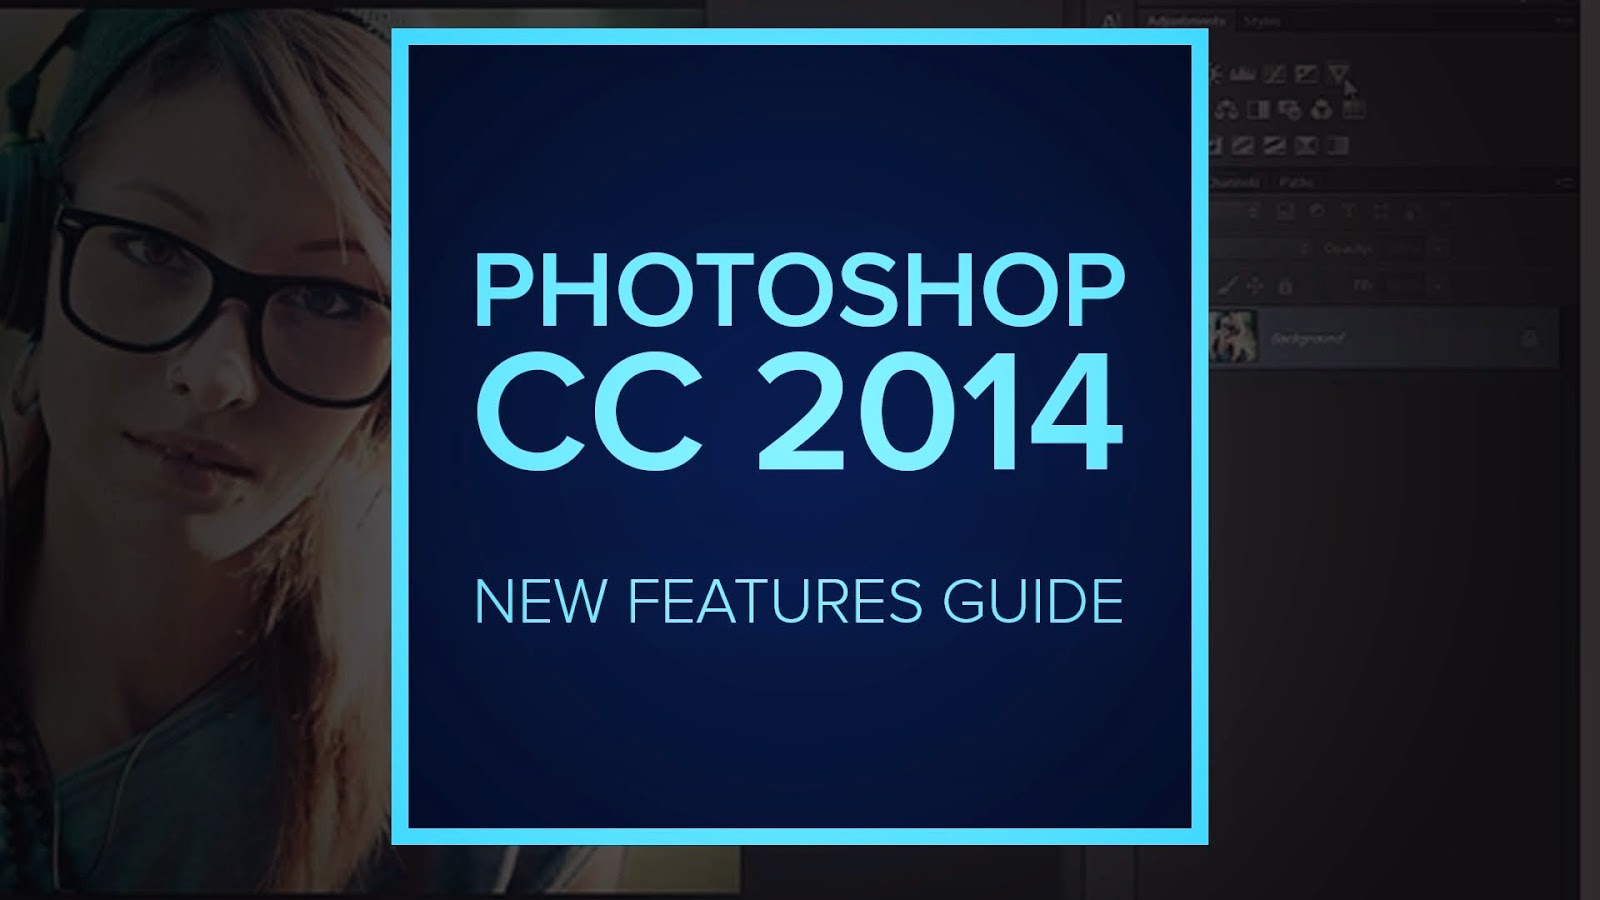 Adobe Photoshop CC 2014 Full Version